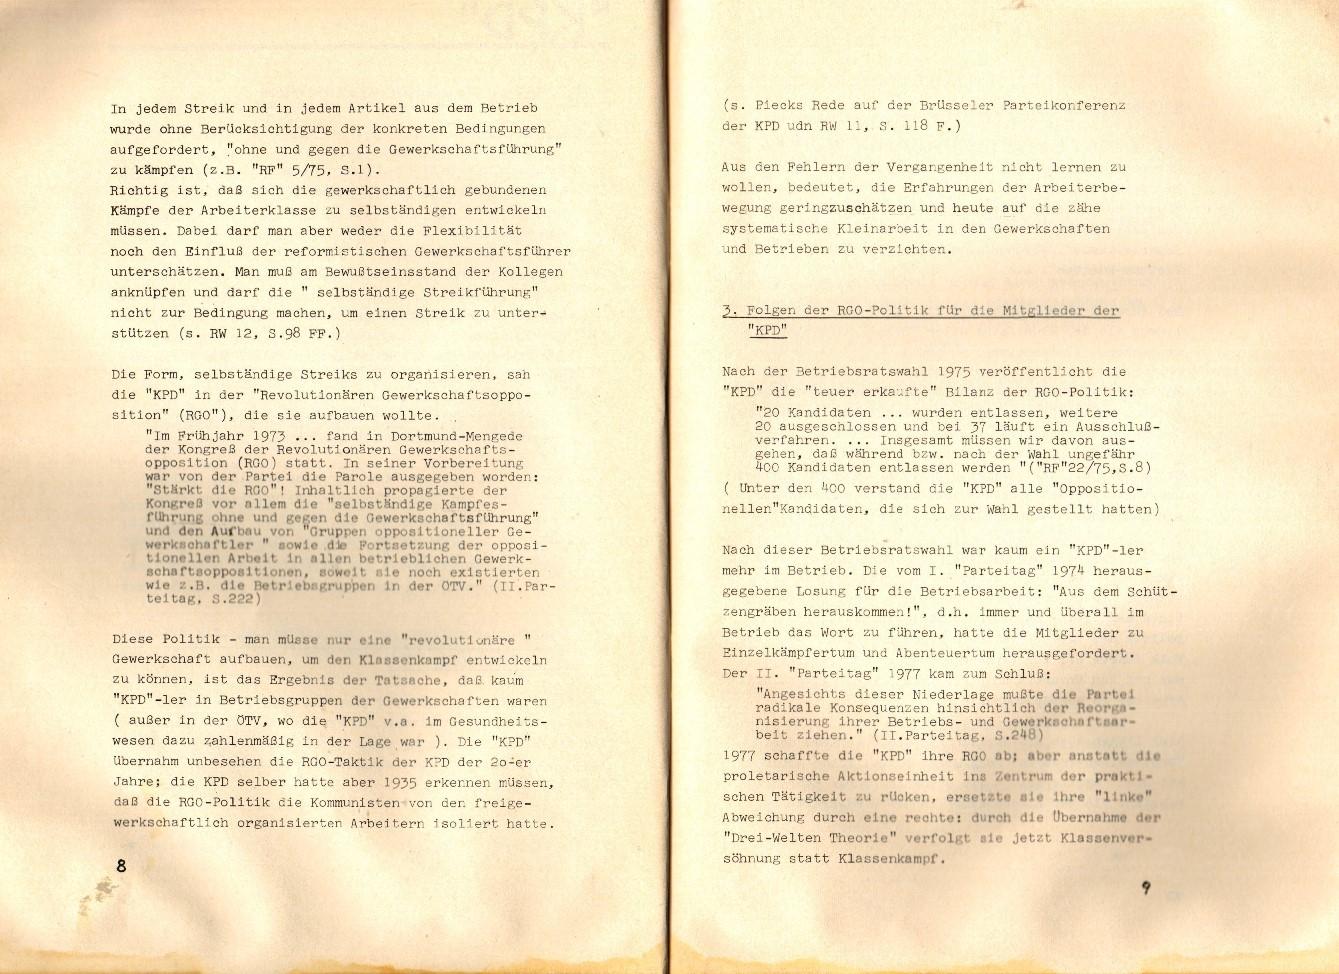 KABD_1978_Argumentationshilfen_06